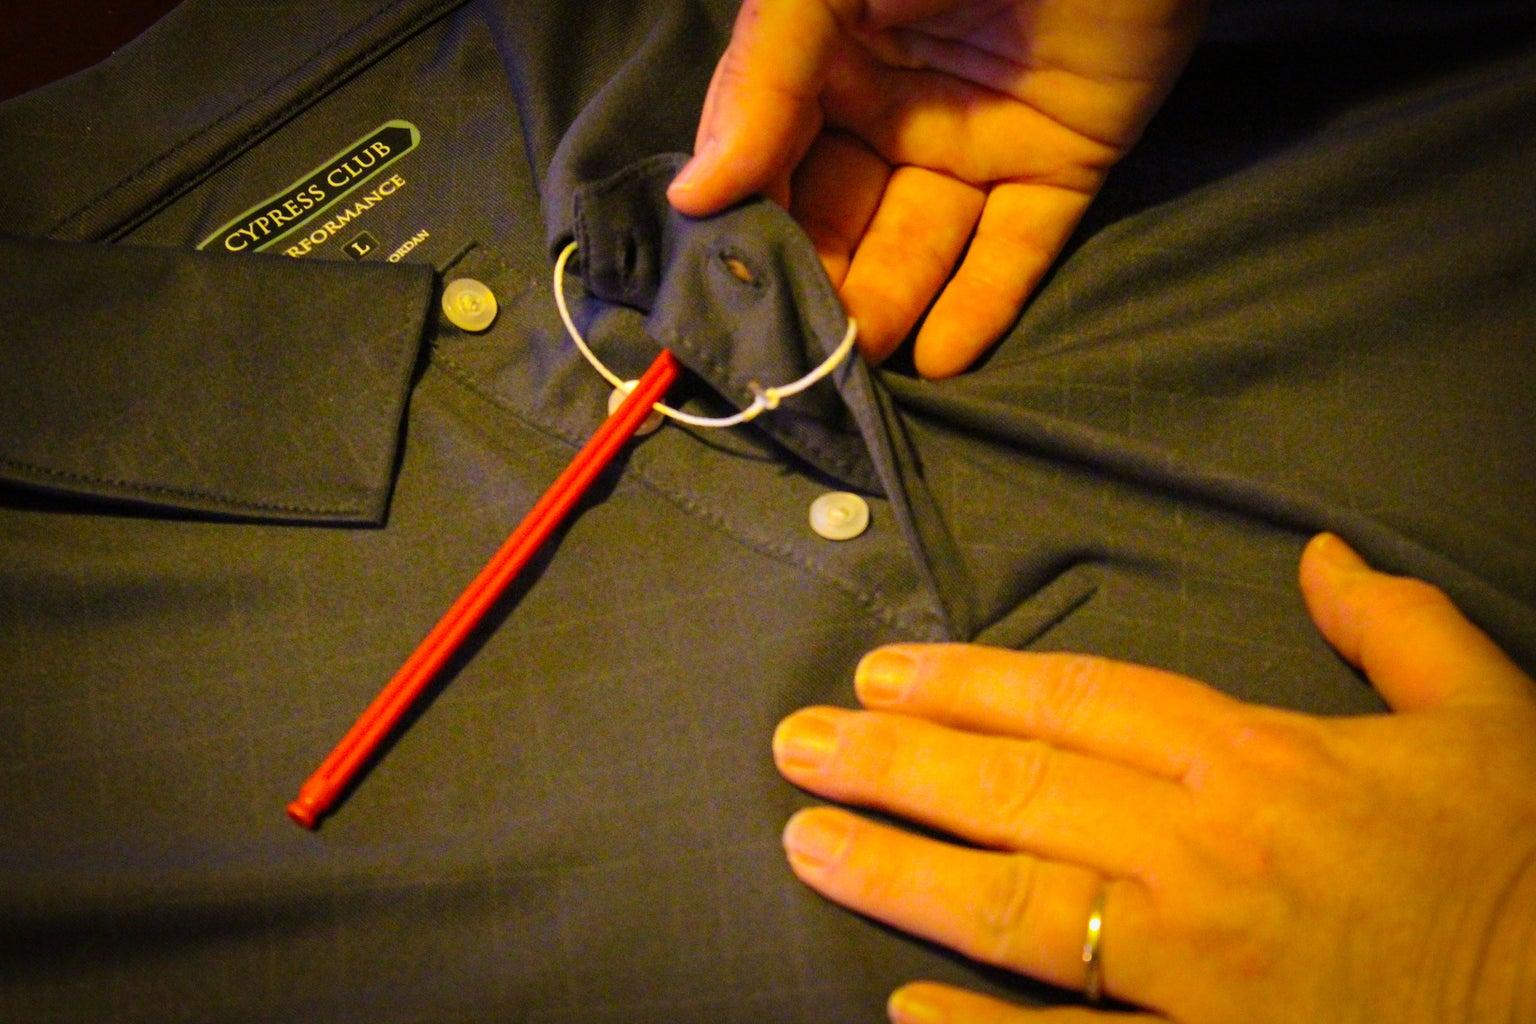 Install - Step 1